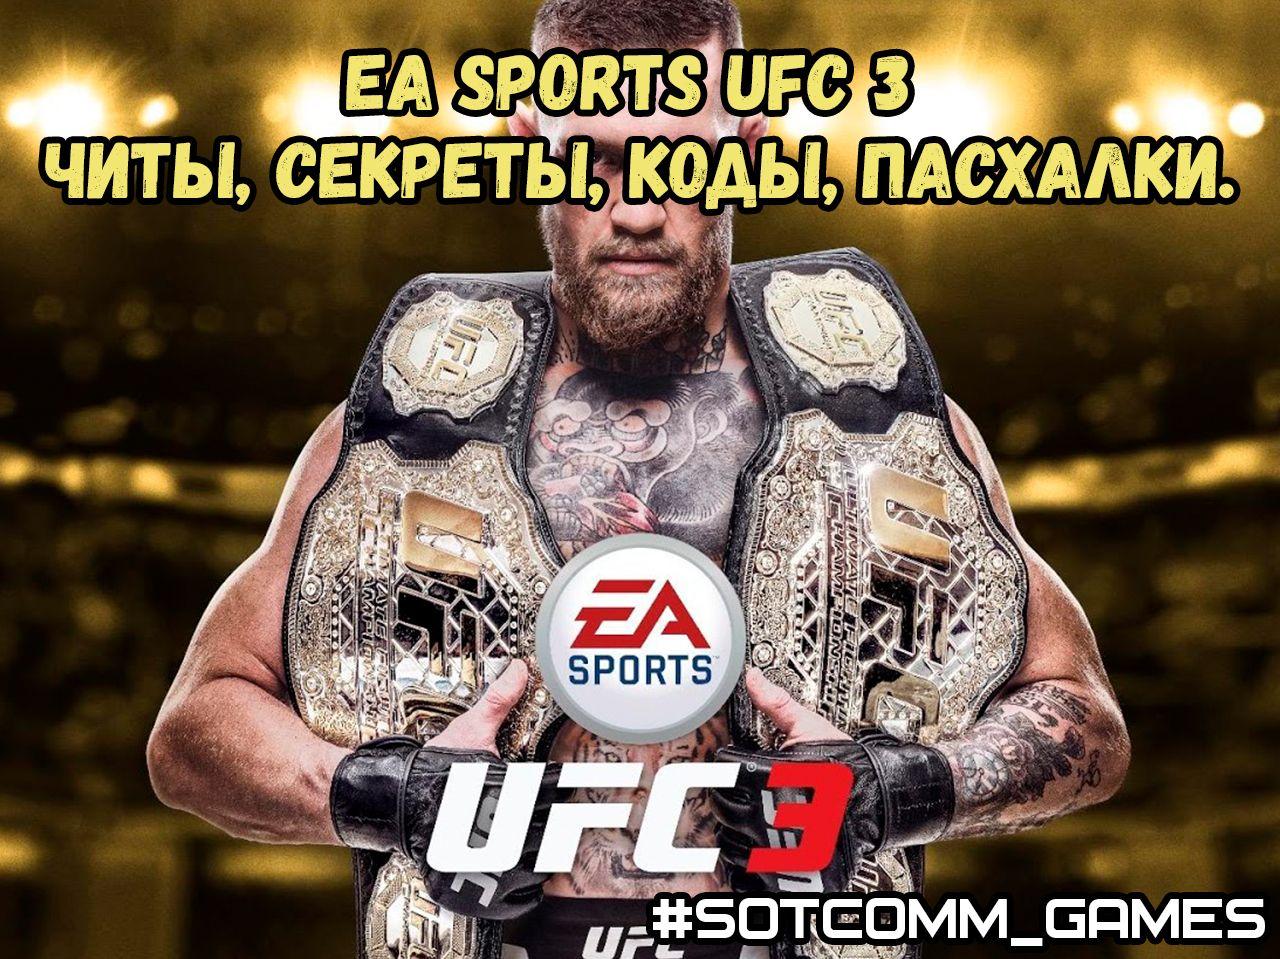 EA Sports UFC 3 Читы, секреты, коды, пасхалки. PS4 Xbox One